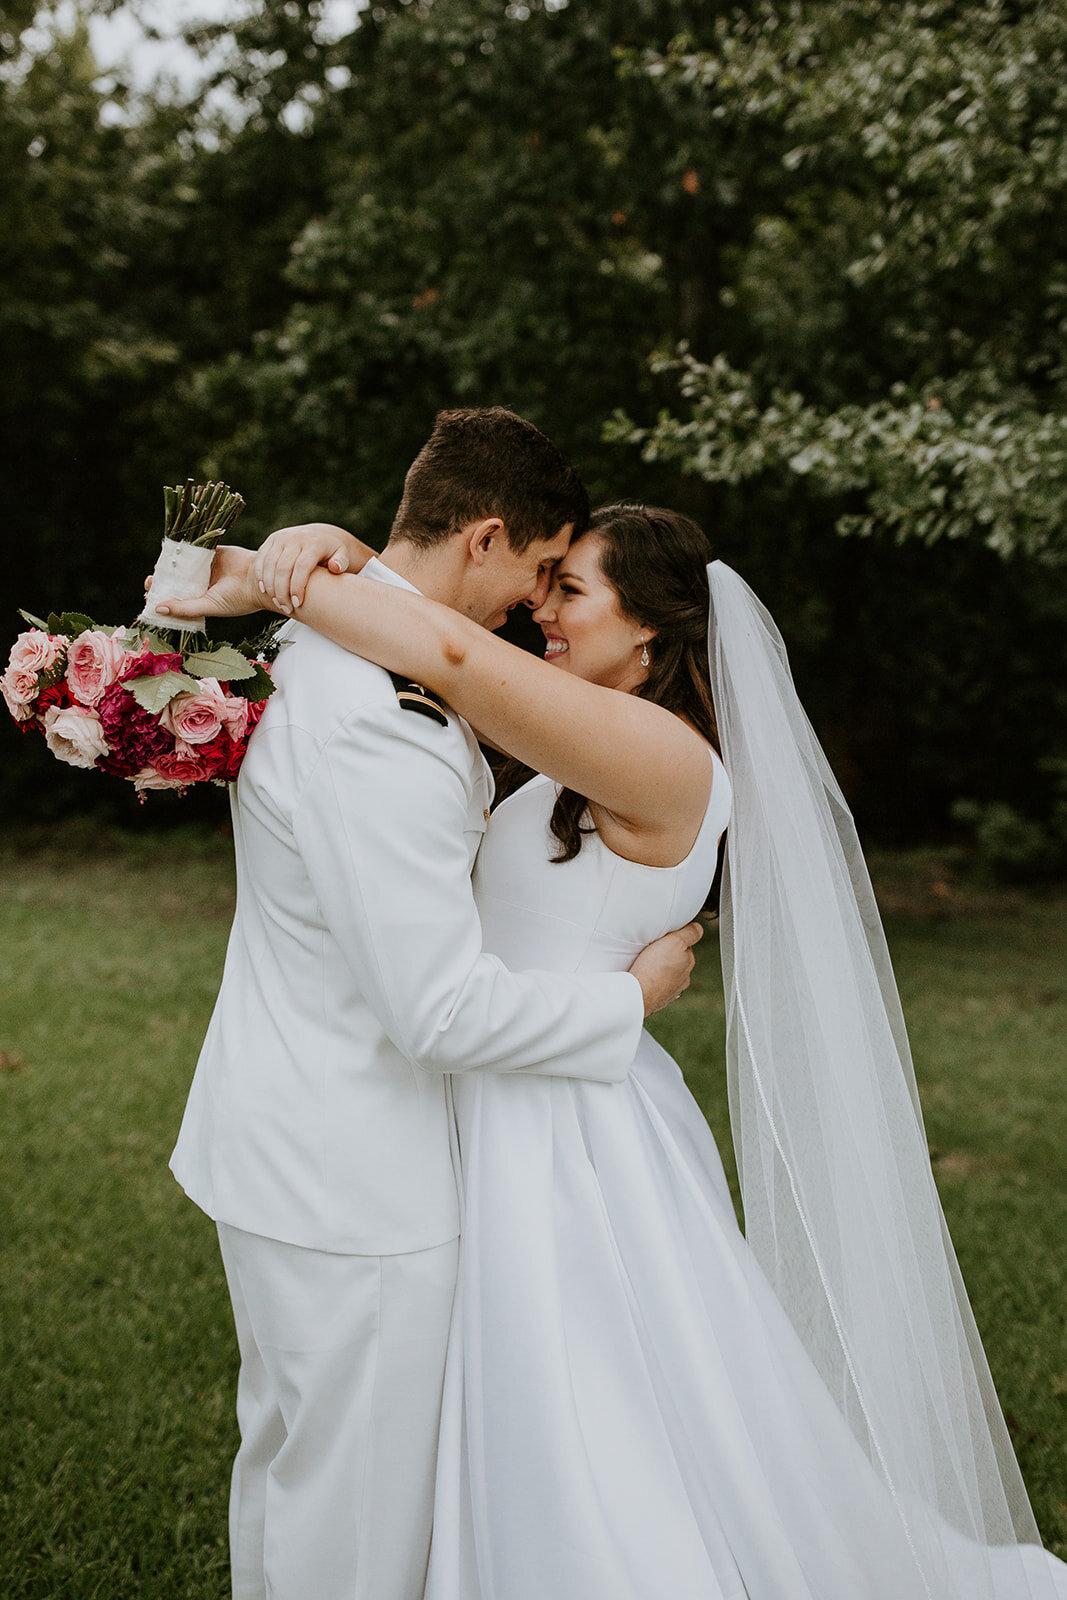 tori-matthews-photography-houston-texas-wedding-photographer-2-749.jpg